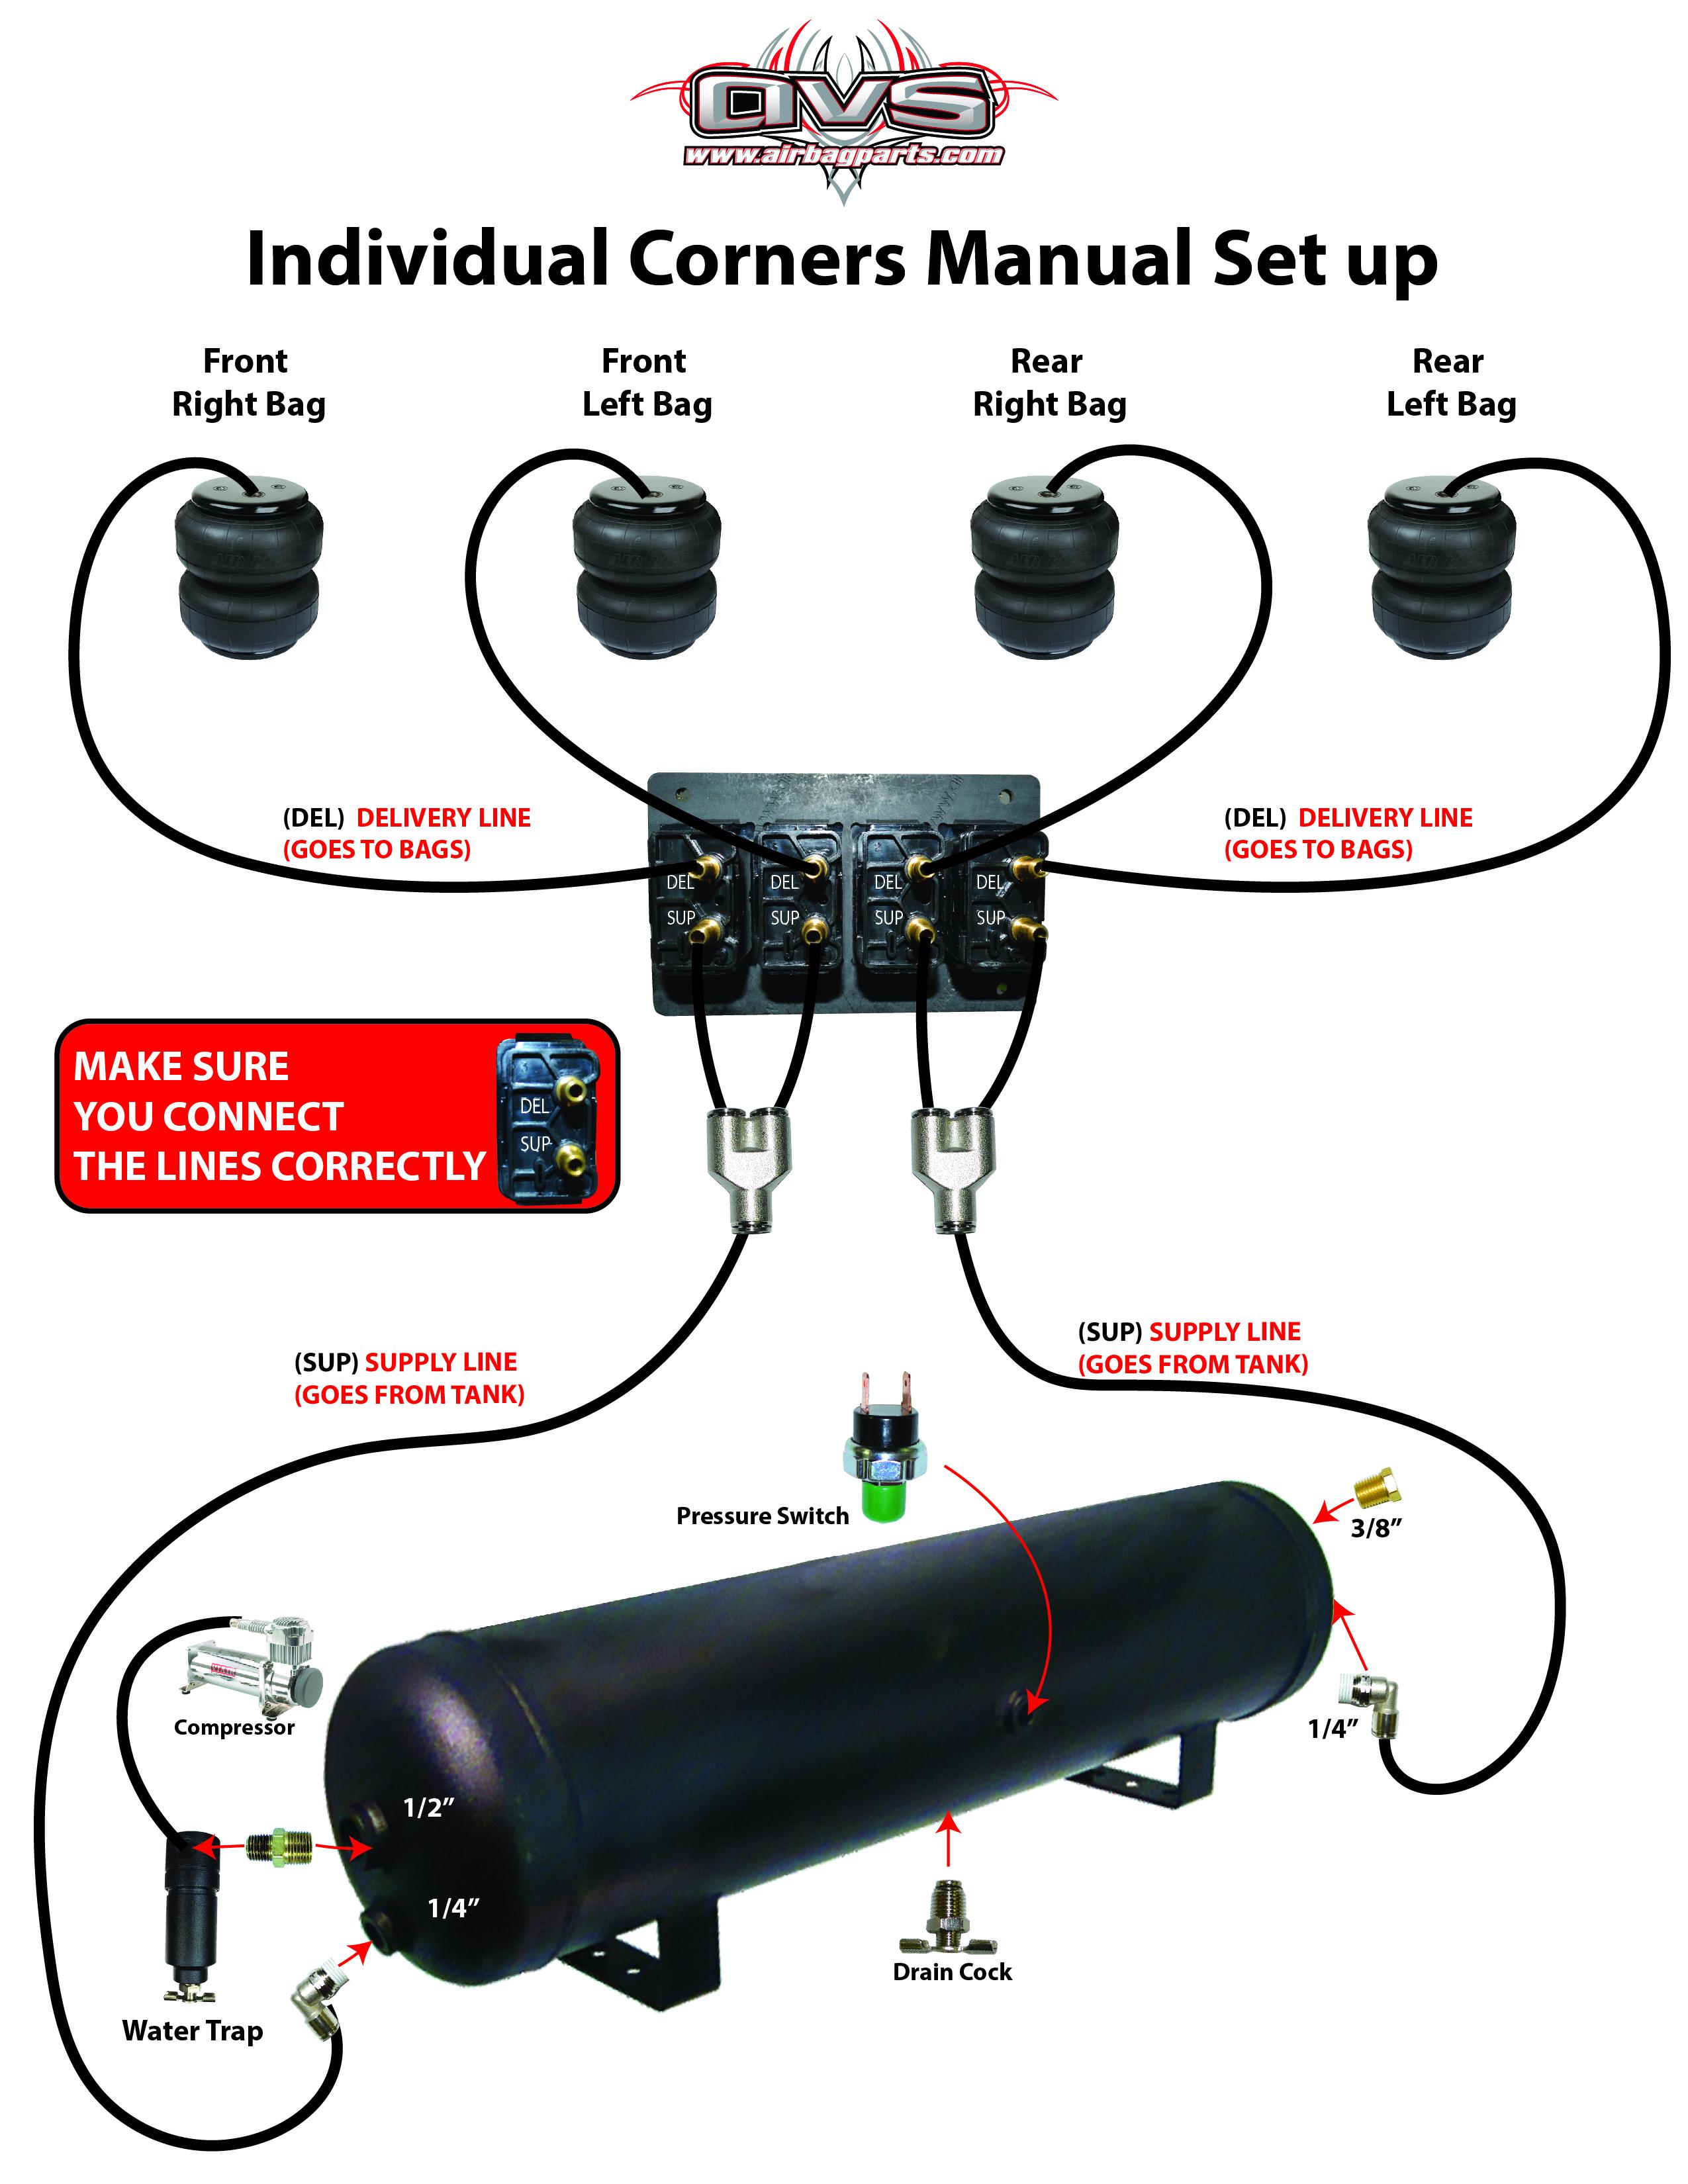 front-back-kit-manual-set-up-4-corners-01.jpg